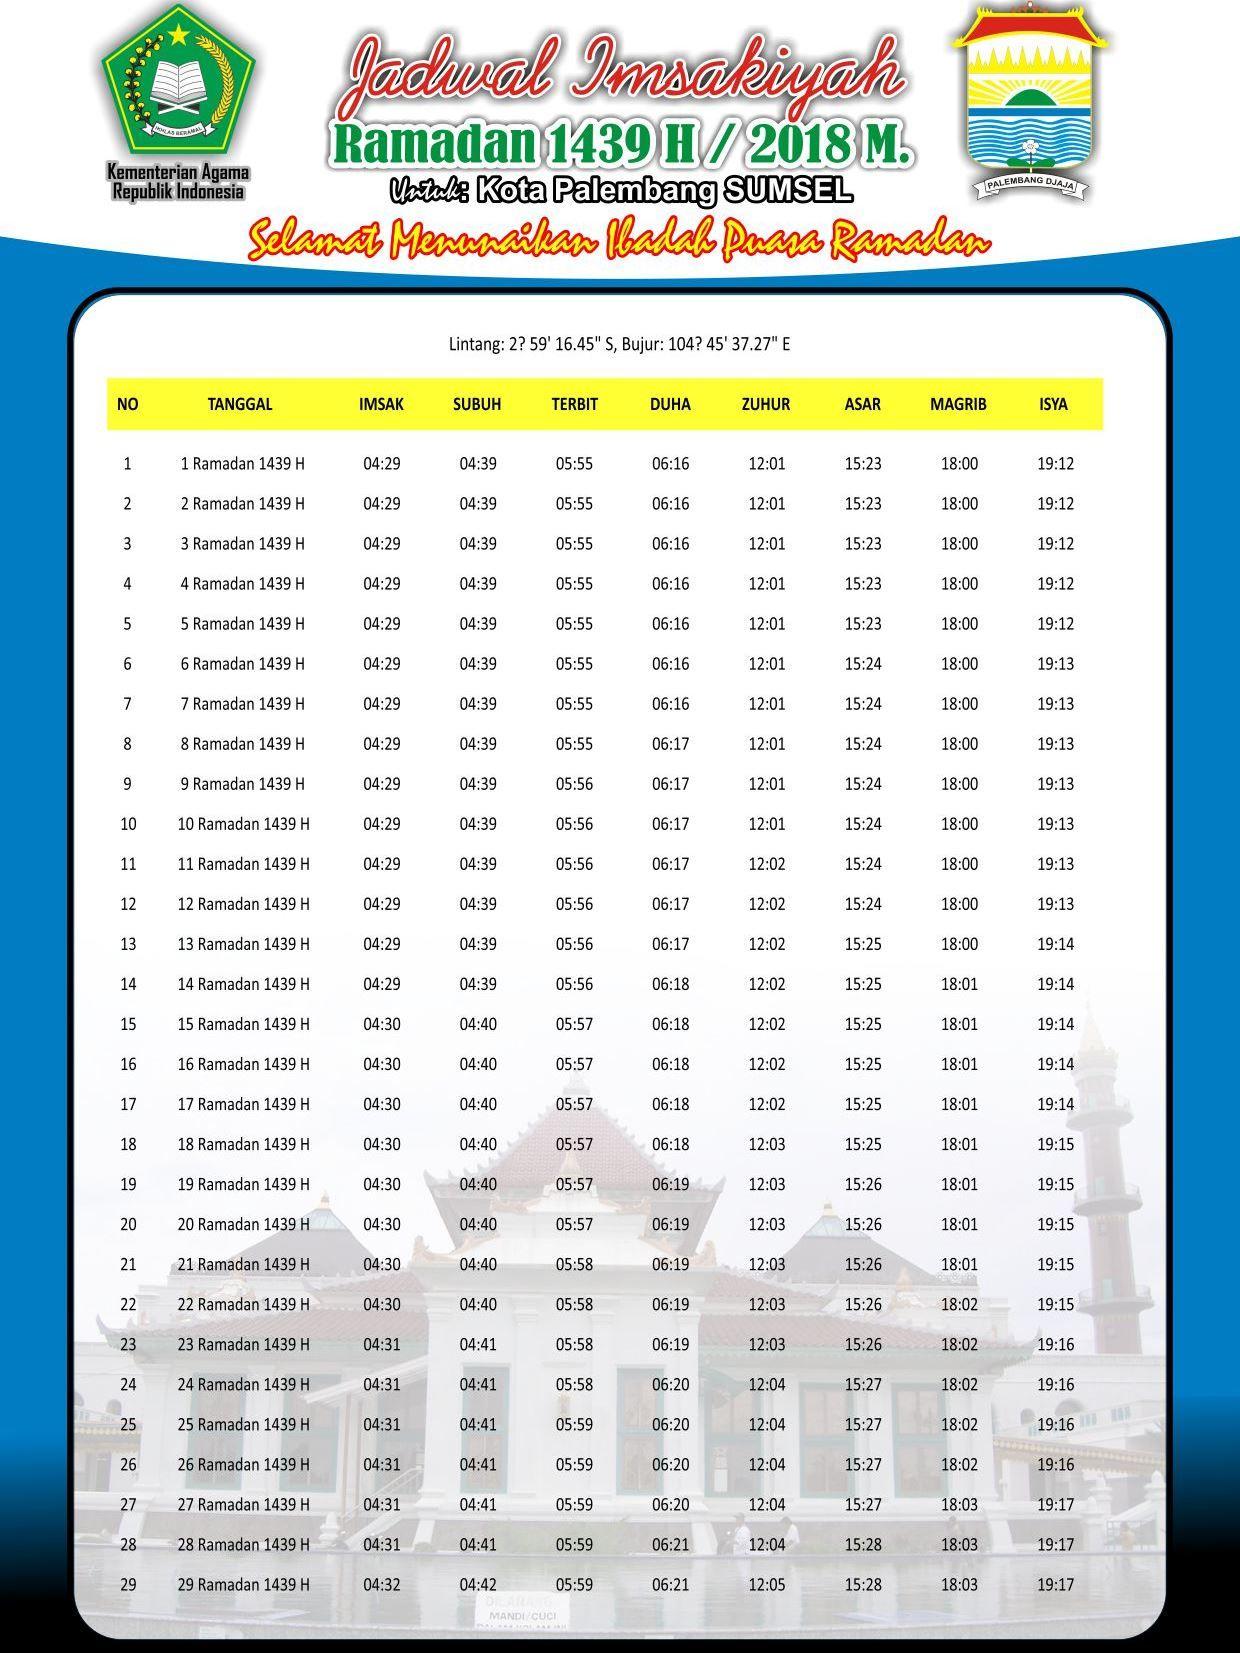 Imsakiyyah Puasa Ramadhan 1439 H 2018 Jadwal Free Download ...